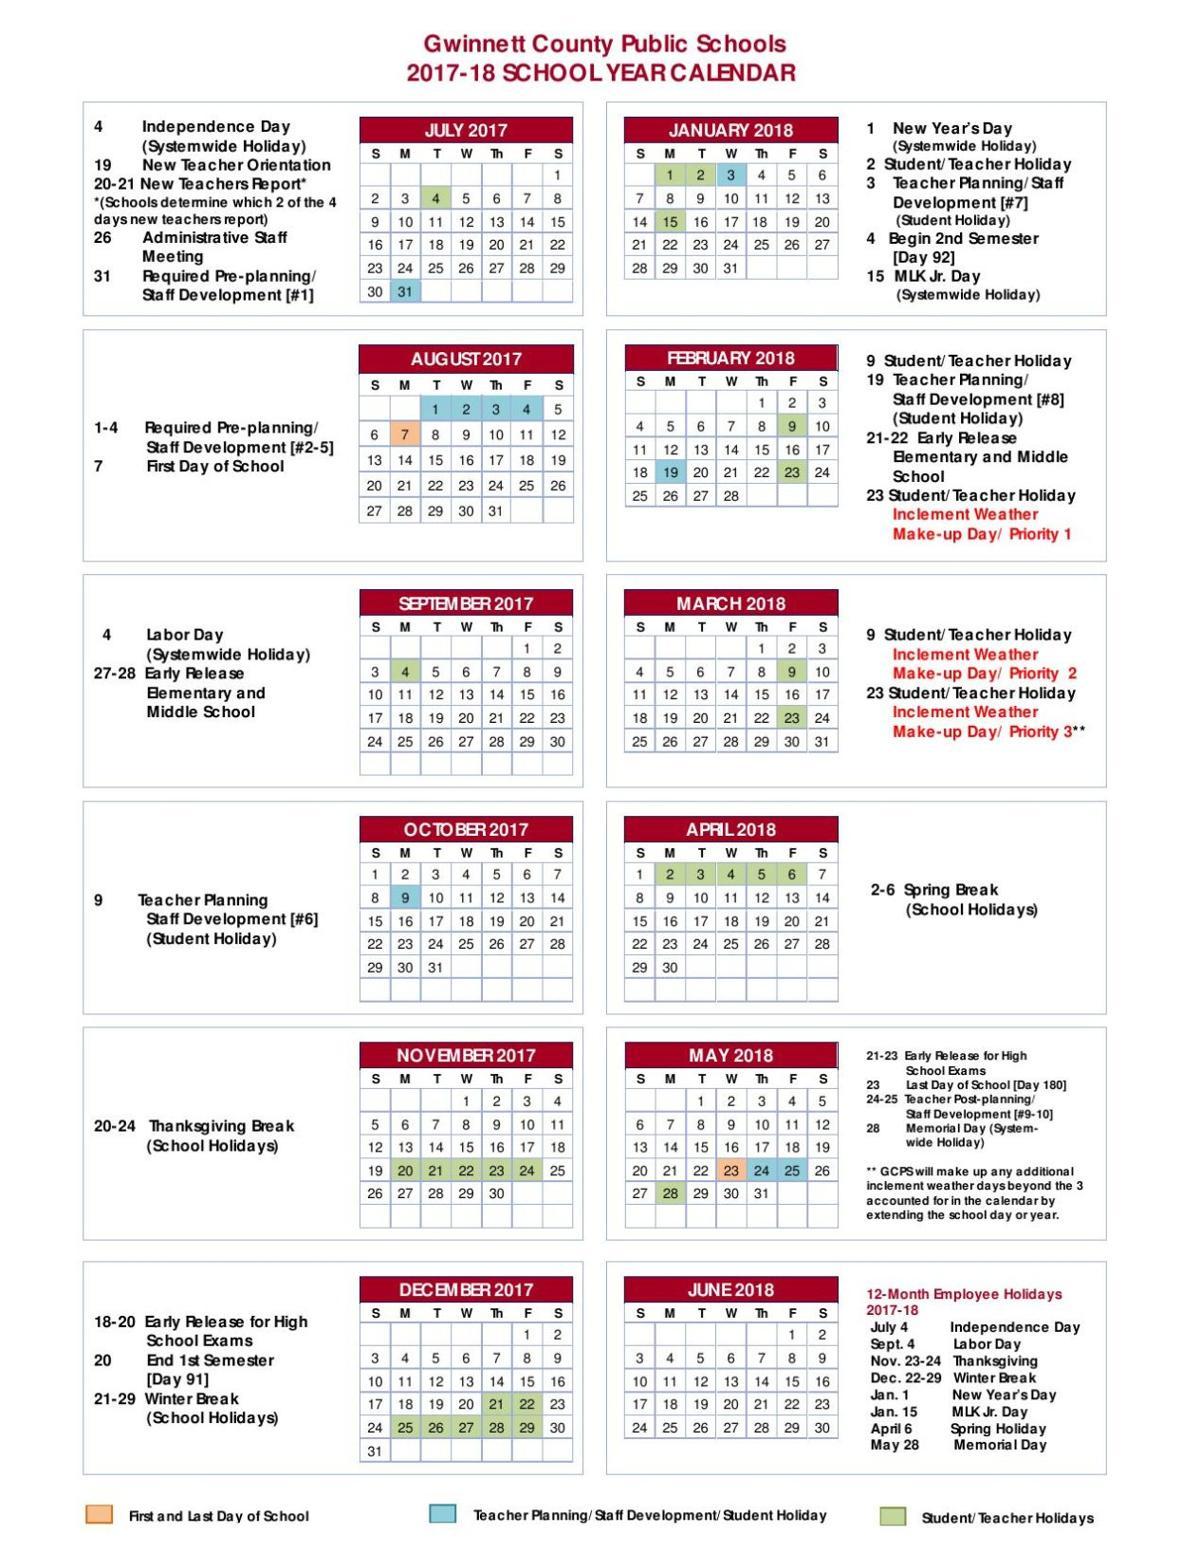 mcps school calendar 2017 18 pdf